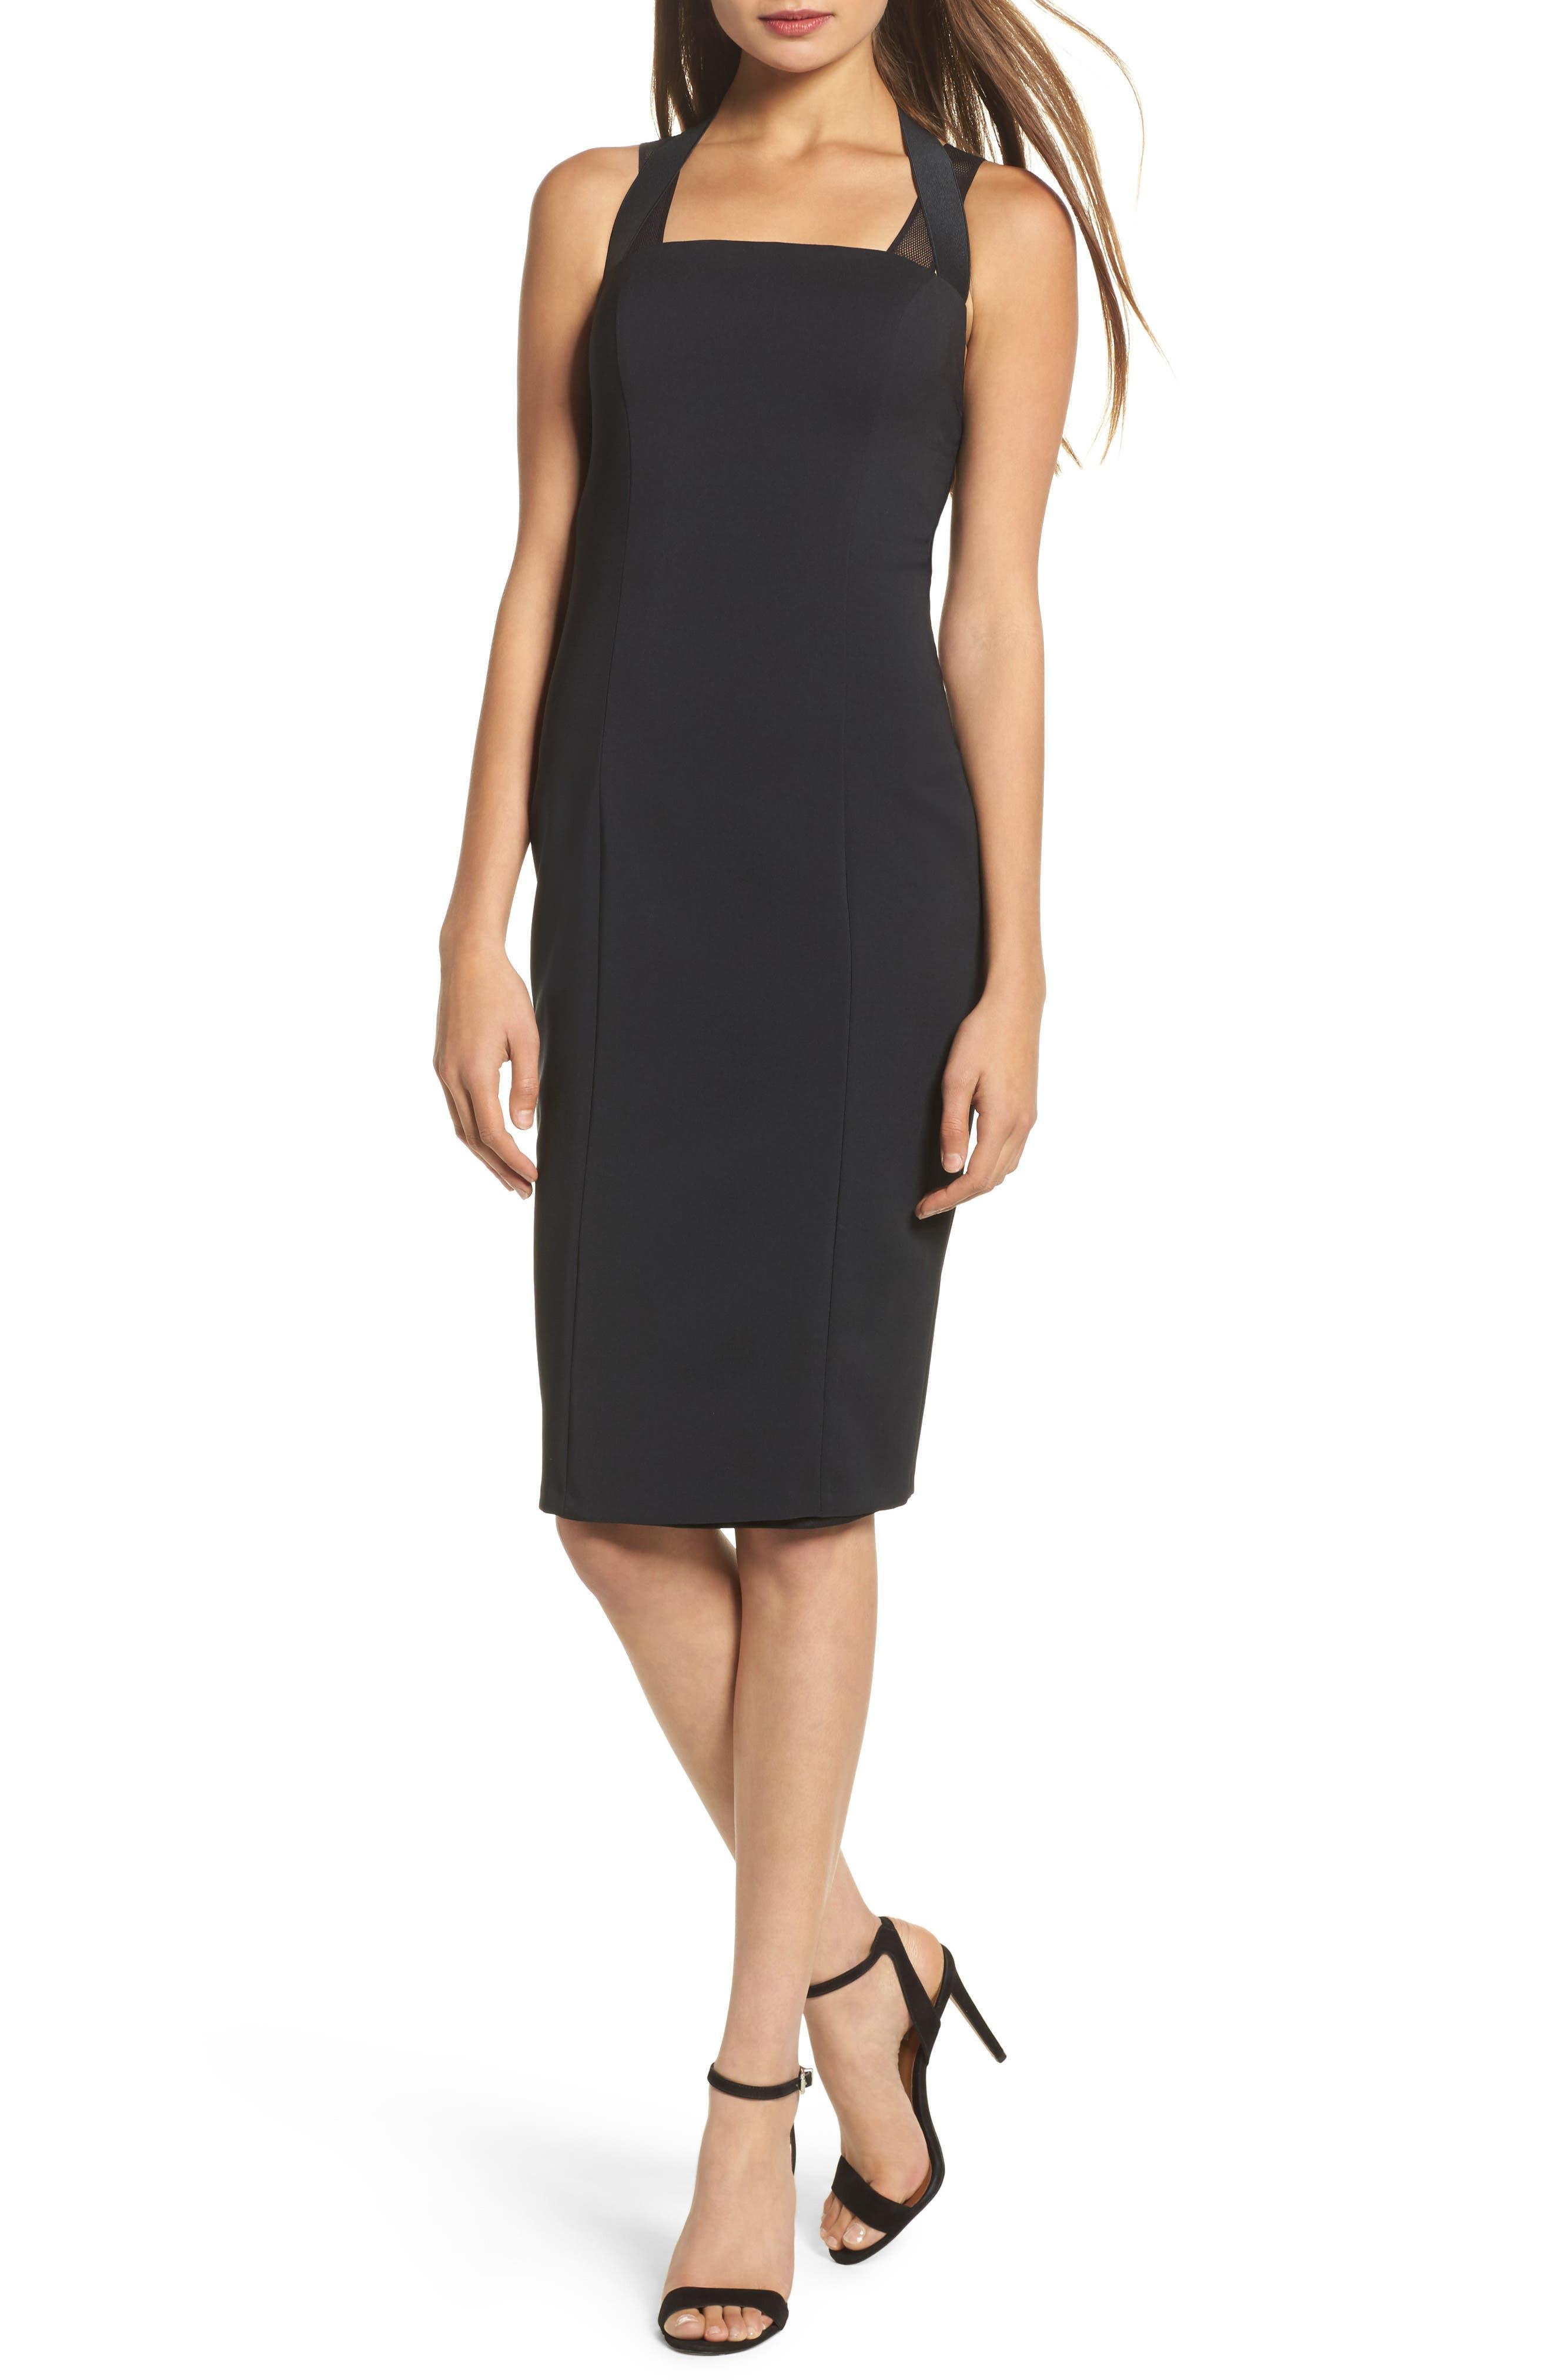 Kendra Elastic Strap Low Back Sheath Dress,                             Main thumbnail 1, color,                             Black